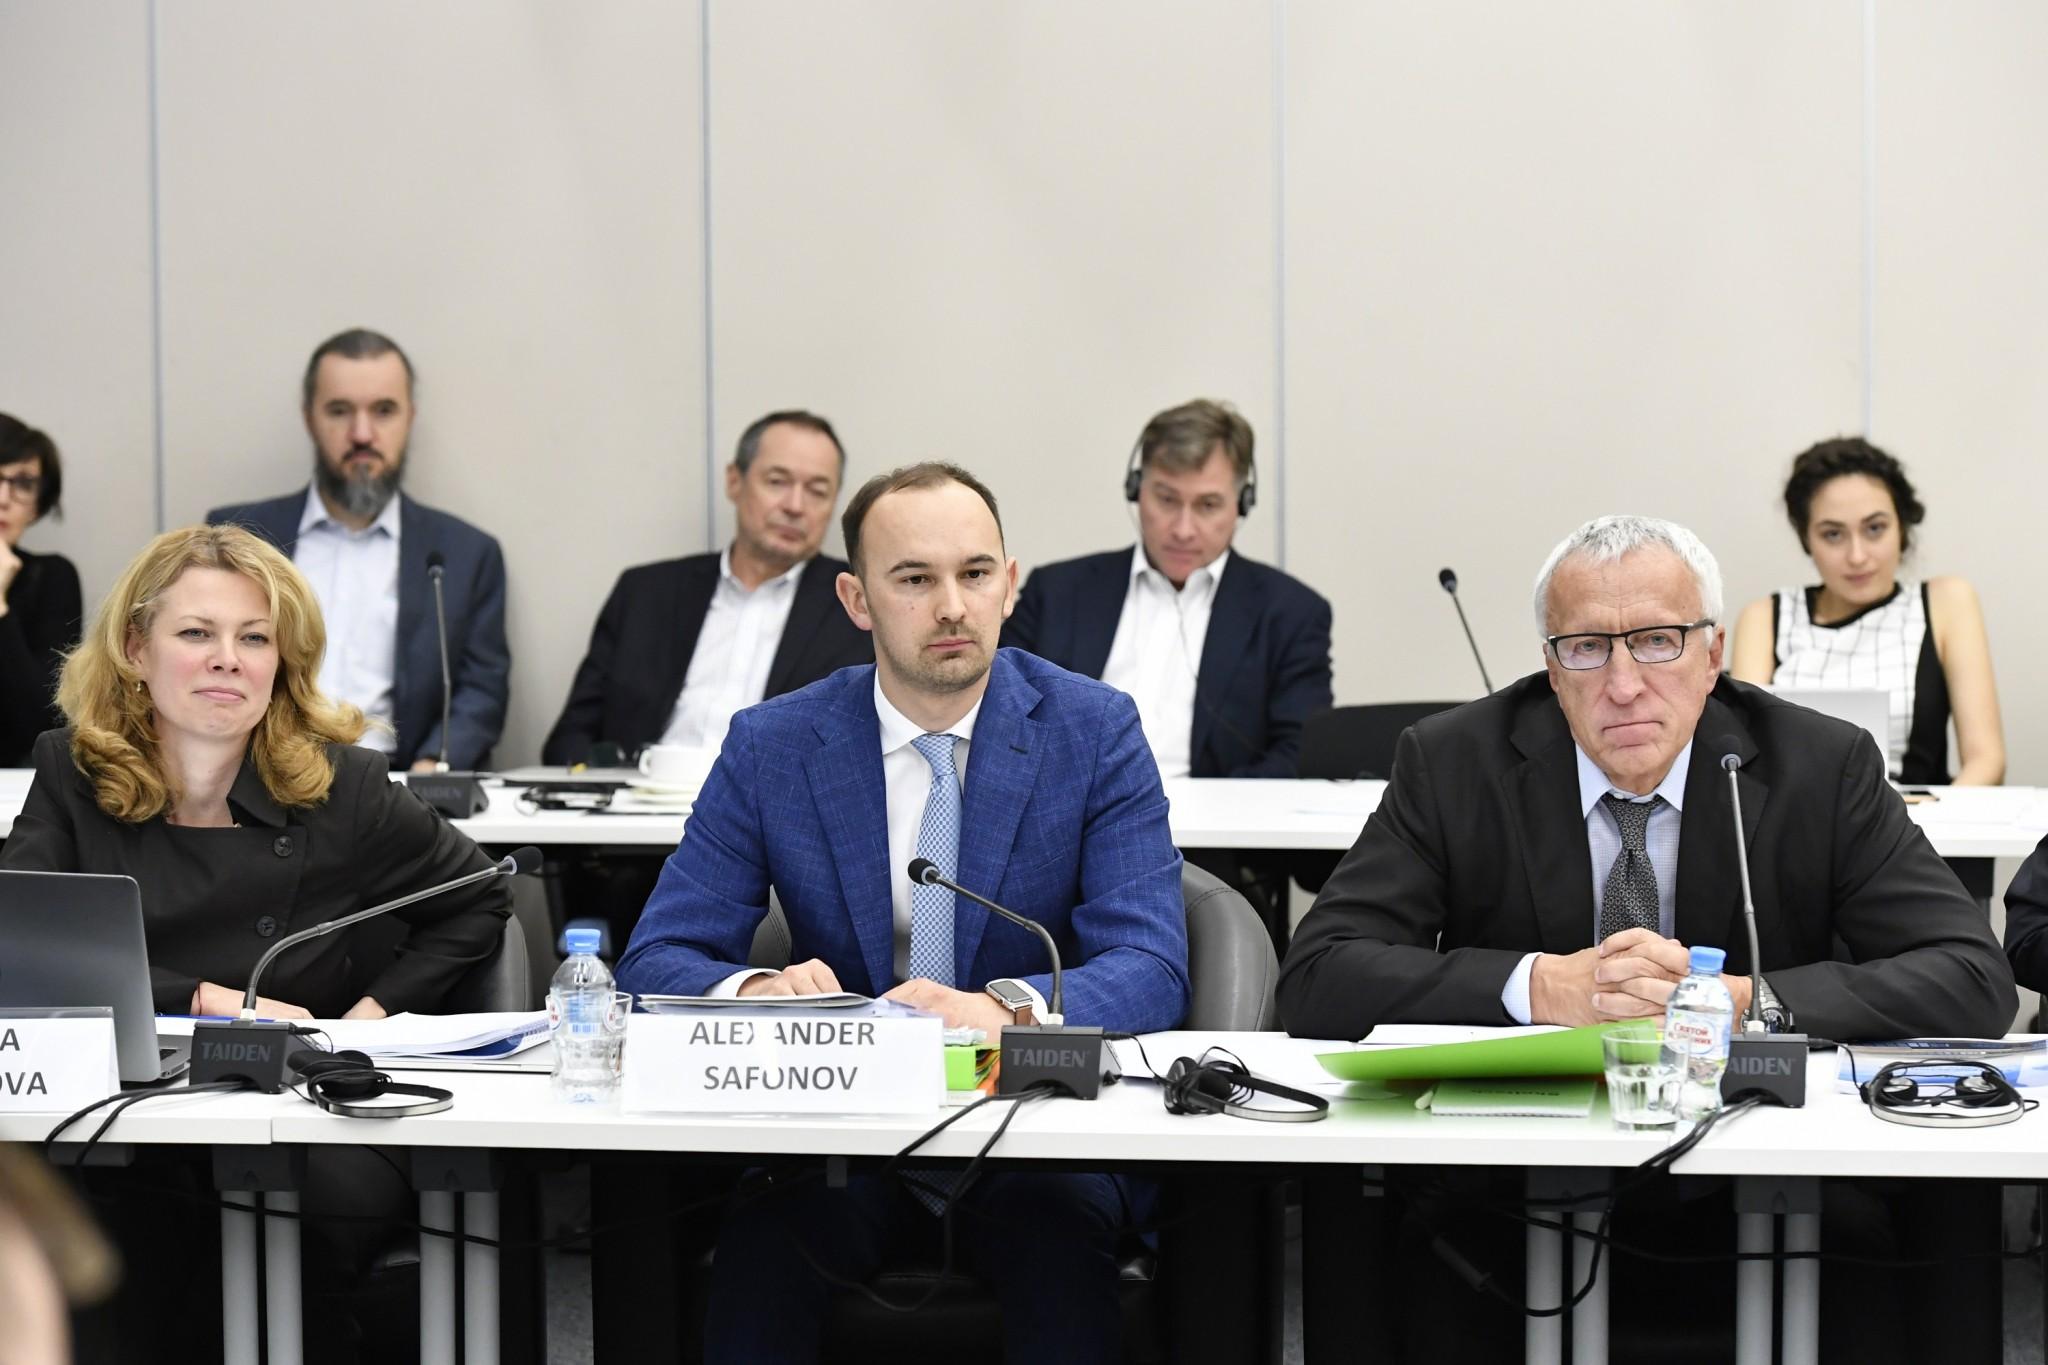 Members of Skoltech's senior leadership, including, from left, Finance Director Tatiana Zakharova, Vice President for Academic Development Alexander Safonov and President Alexander Kuleshov. Photo: Skoltech.